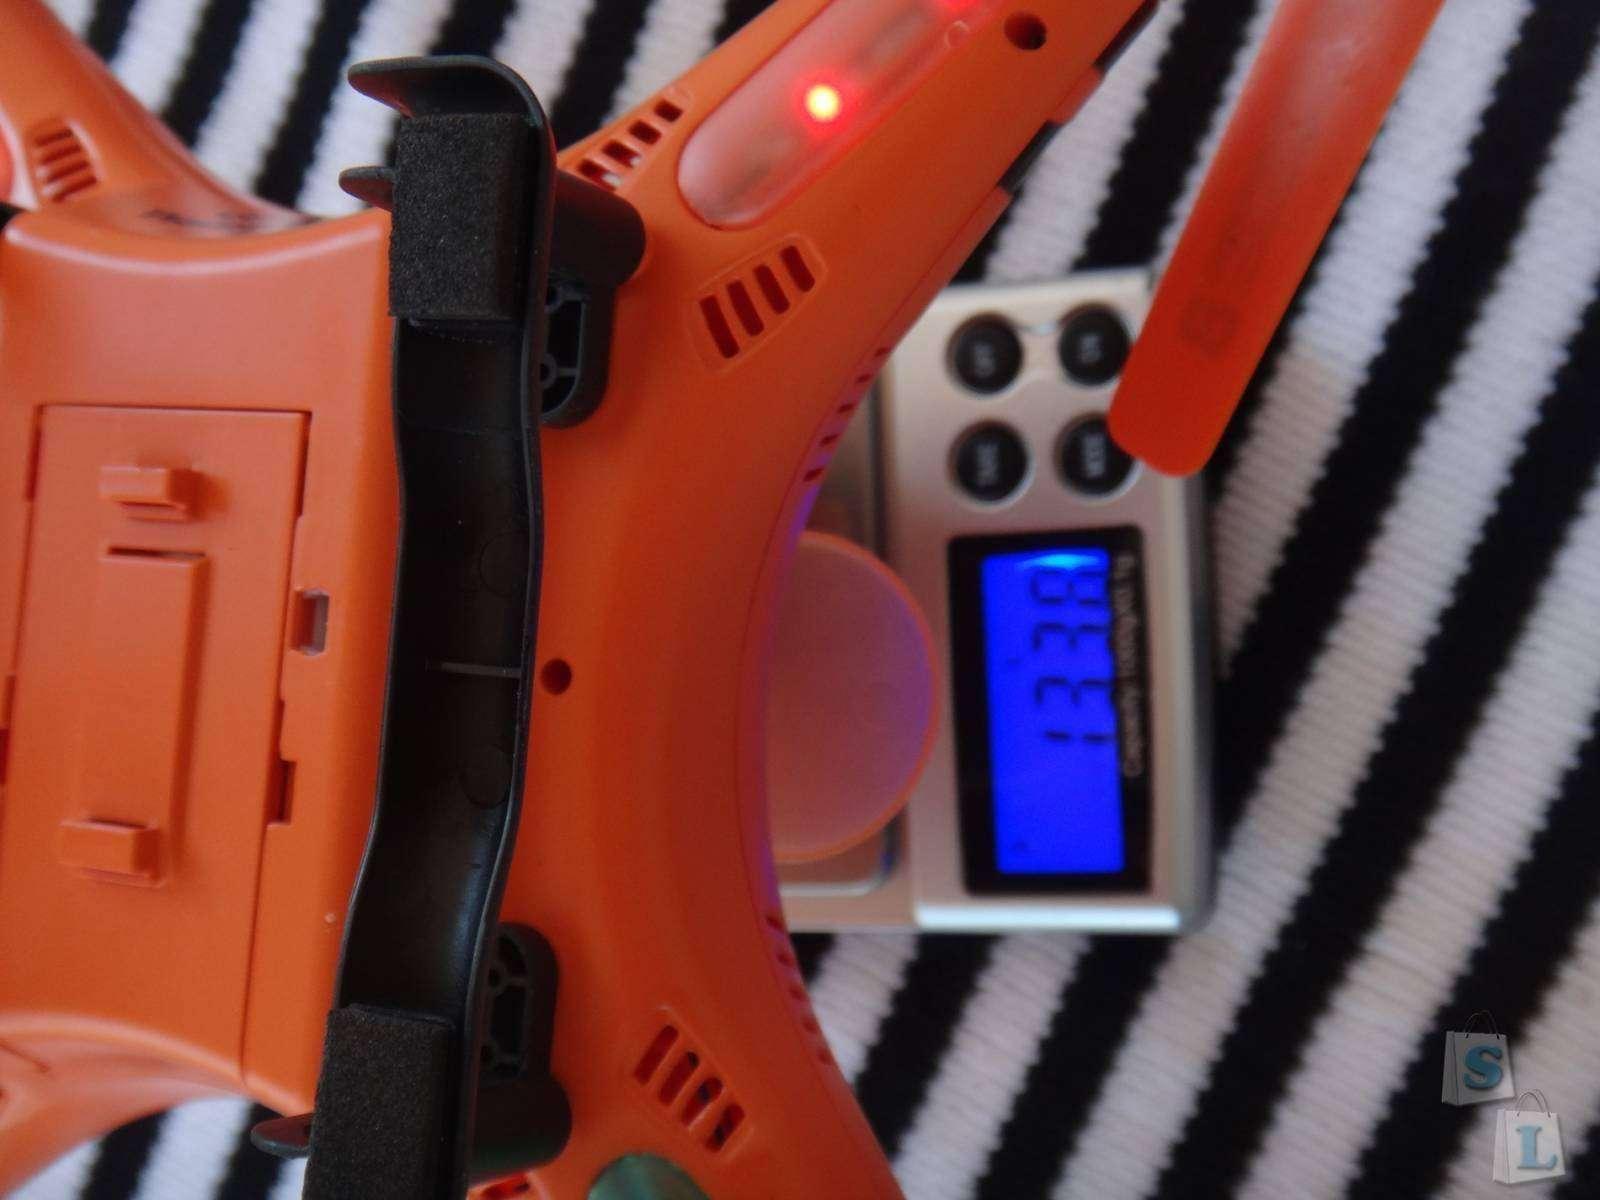 Aliexpress: Обзор GPToys H2O Aviax Waterproof Drone - квадрокоптер который не боится воды